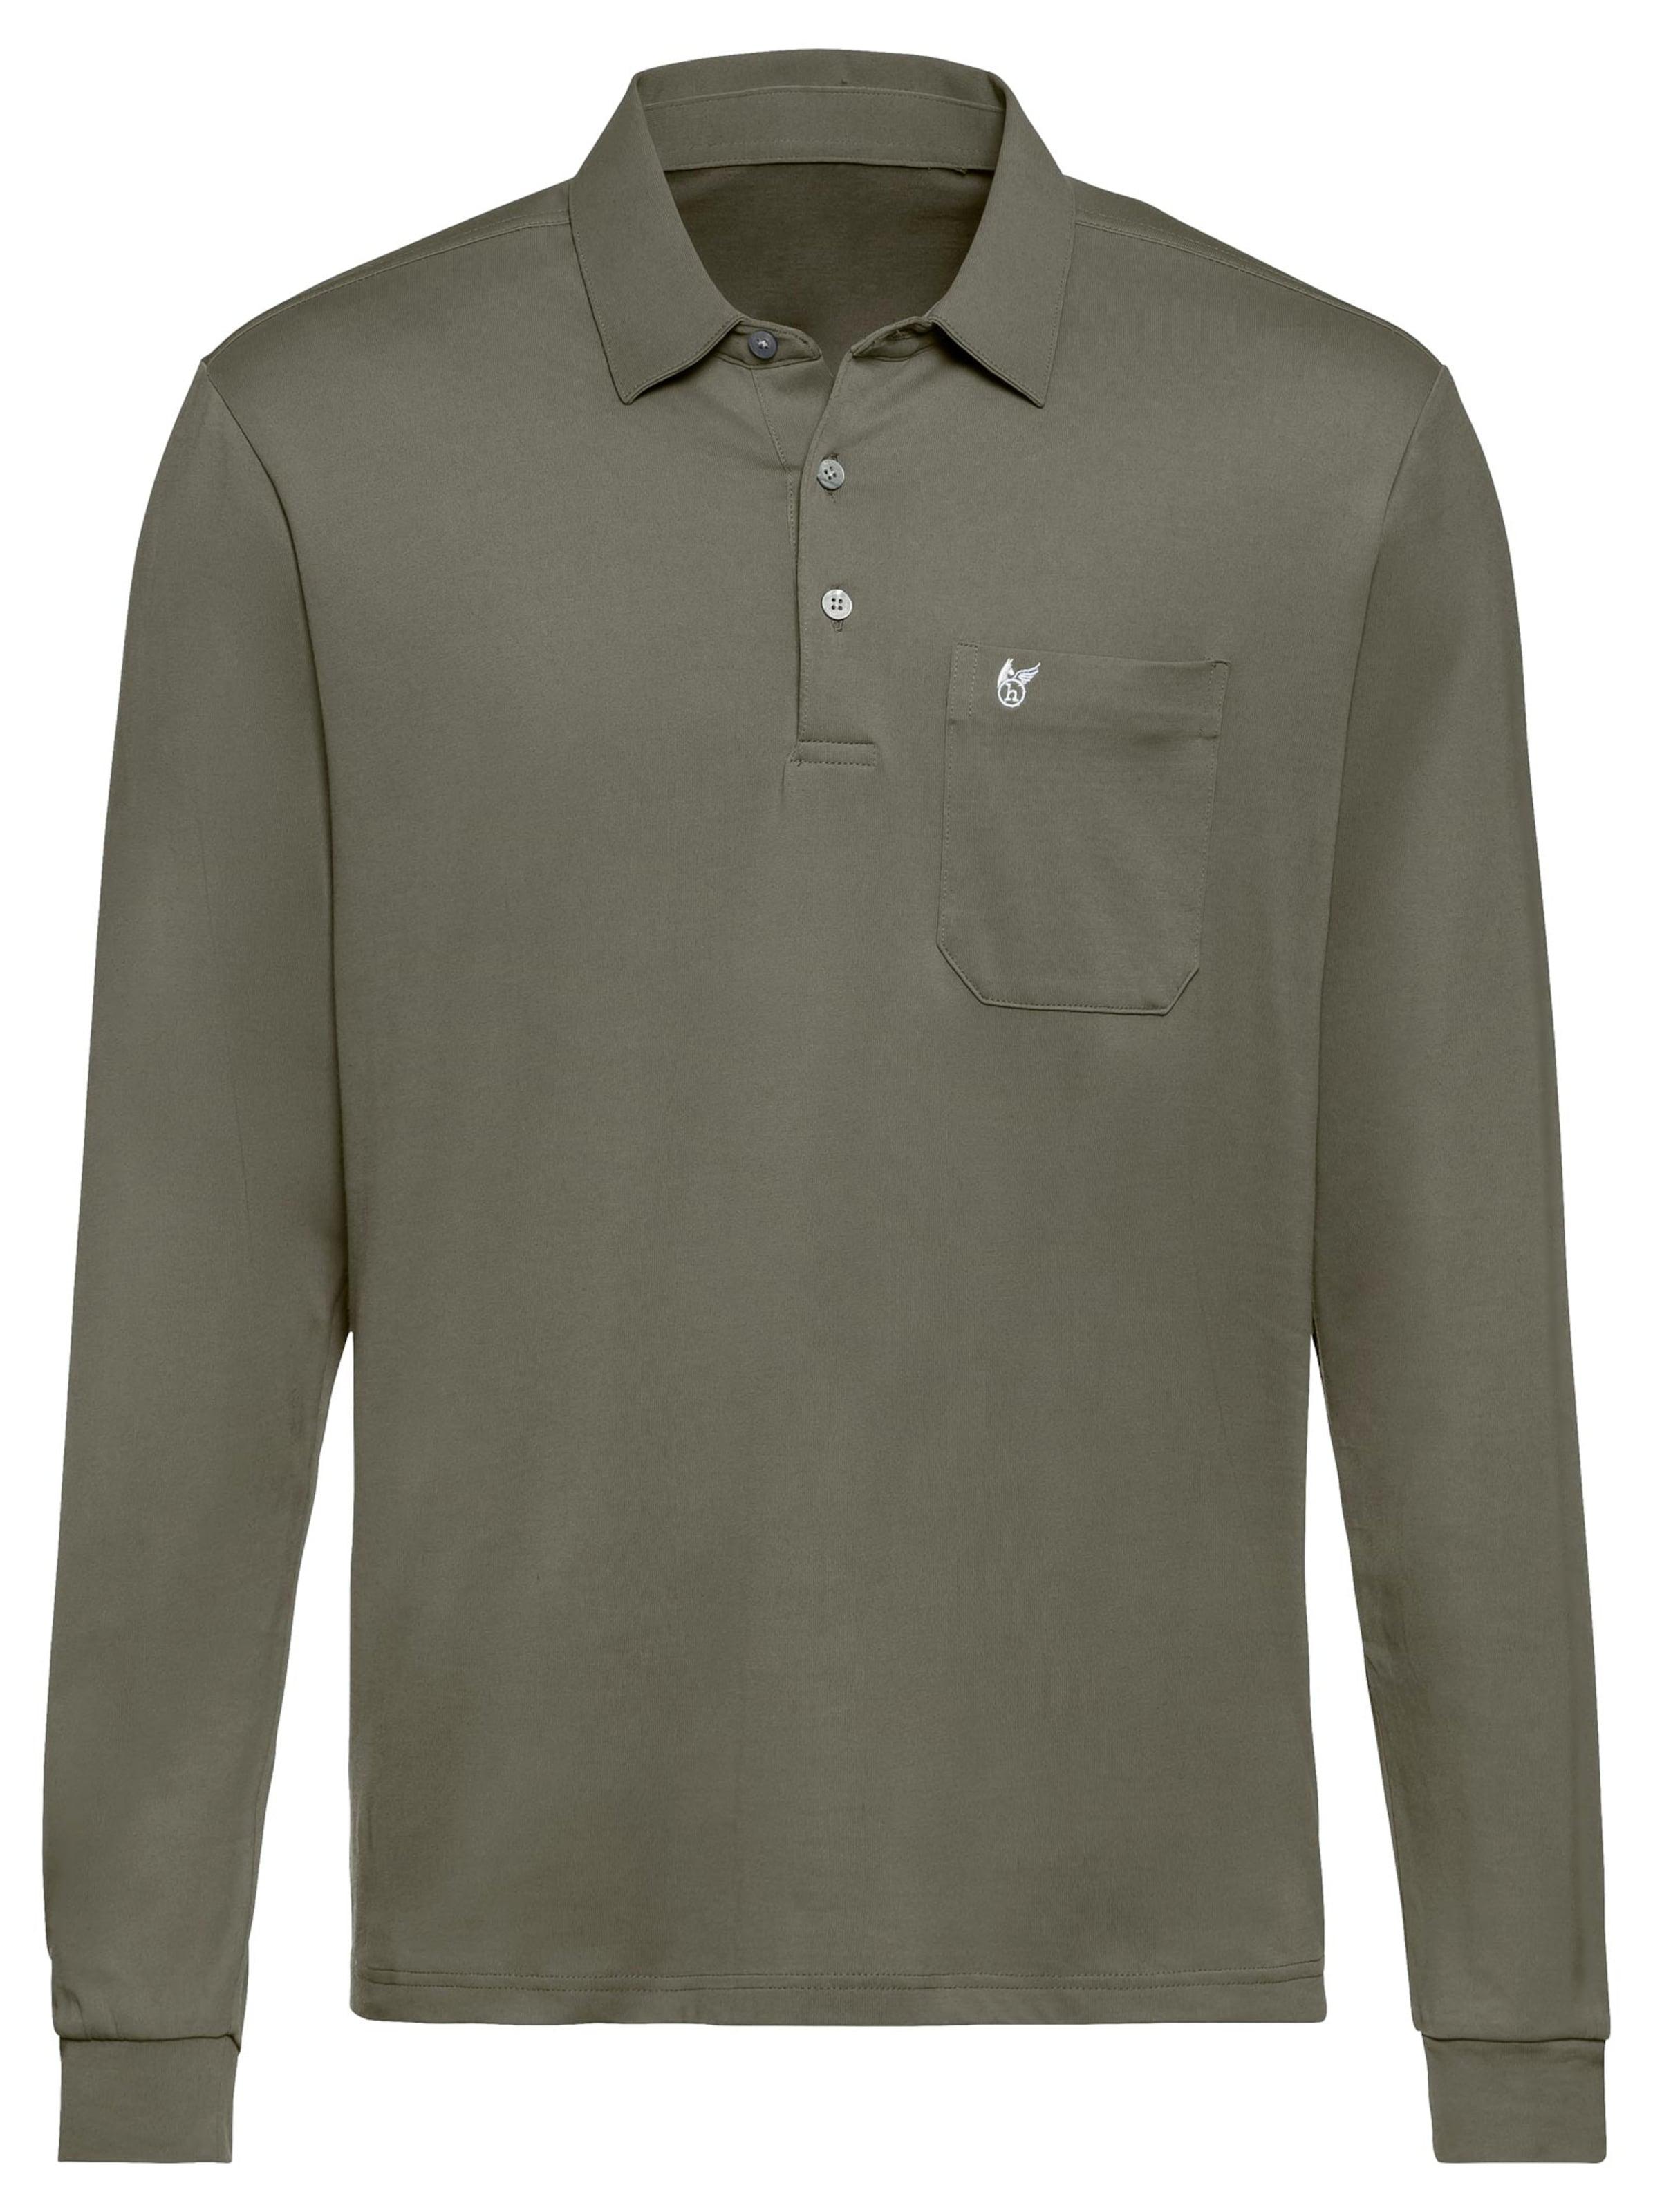 hajo - Witt Weiden Herren Langarm-Poloshirt khaki